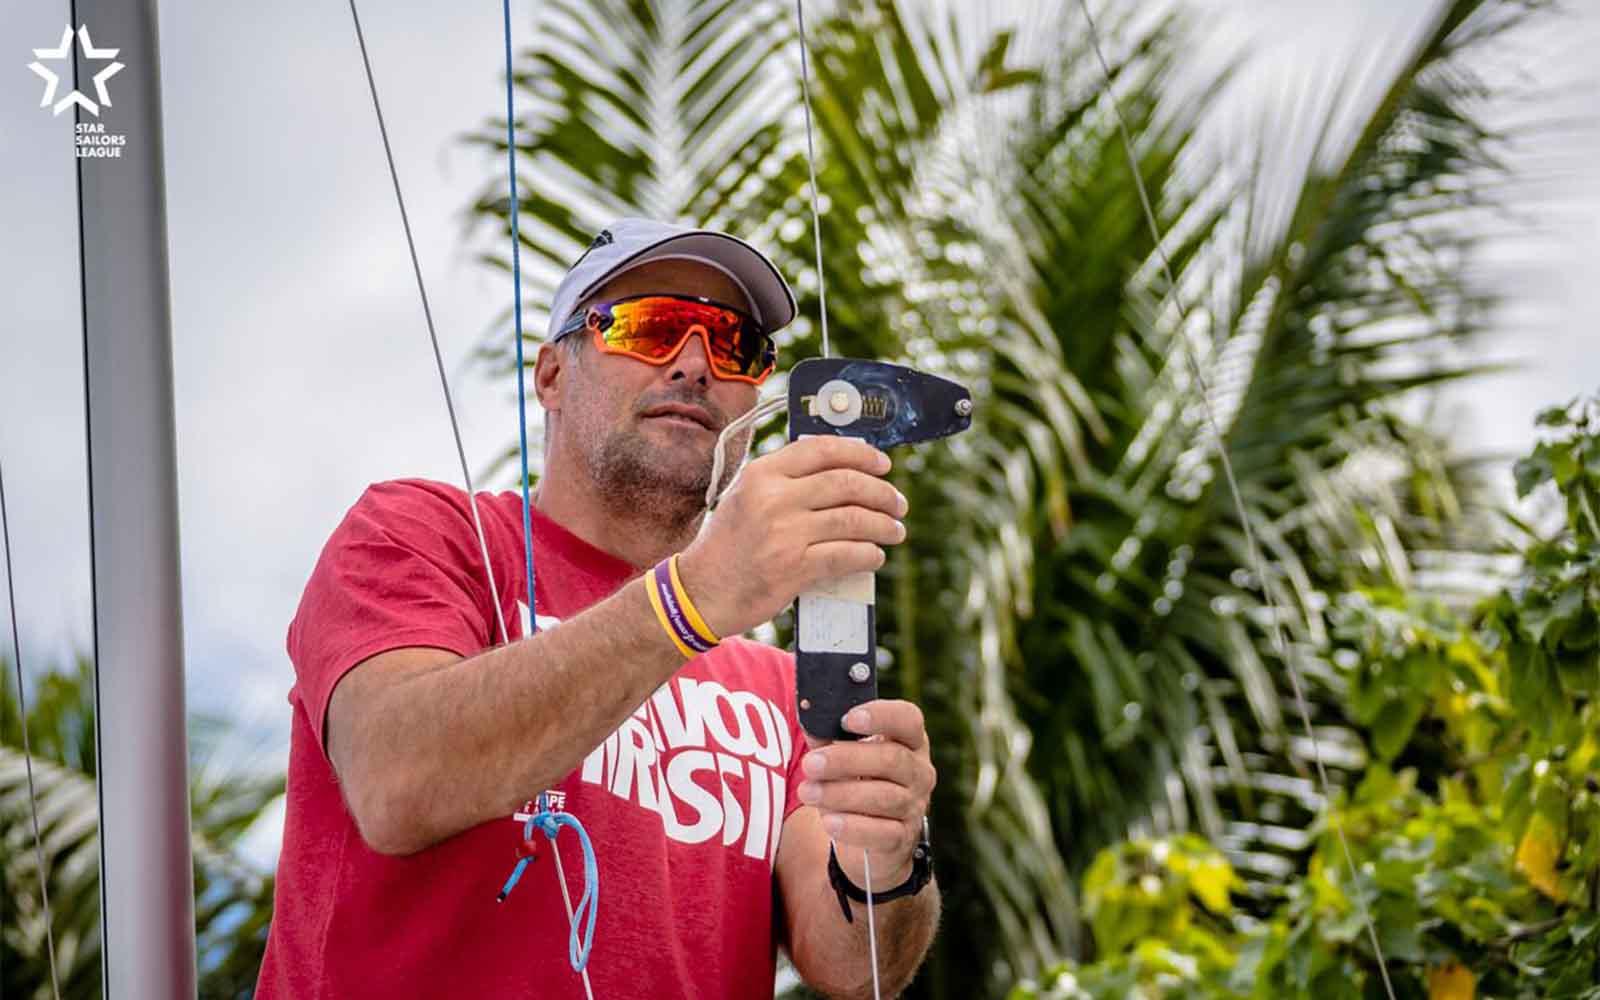 Bruno Prada (Gilles Morelle SSL) - boat shopping